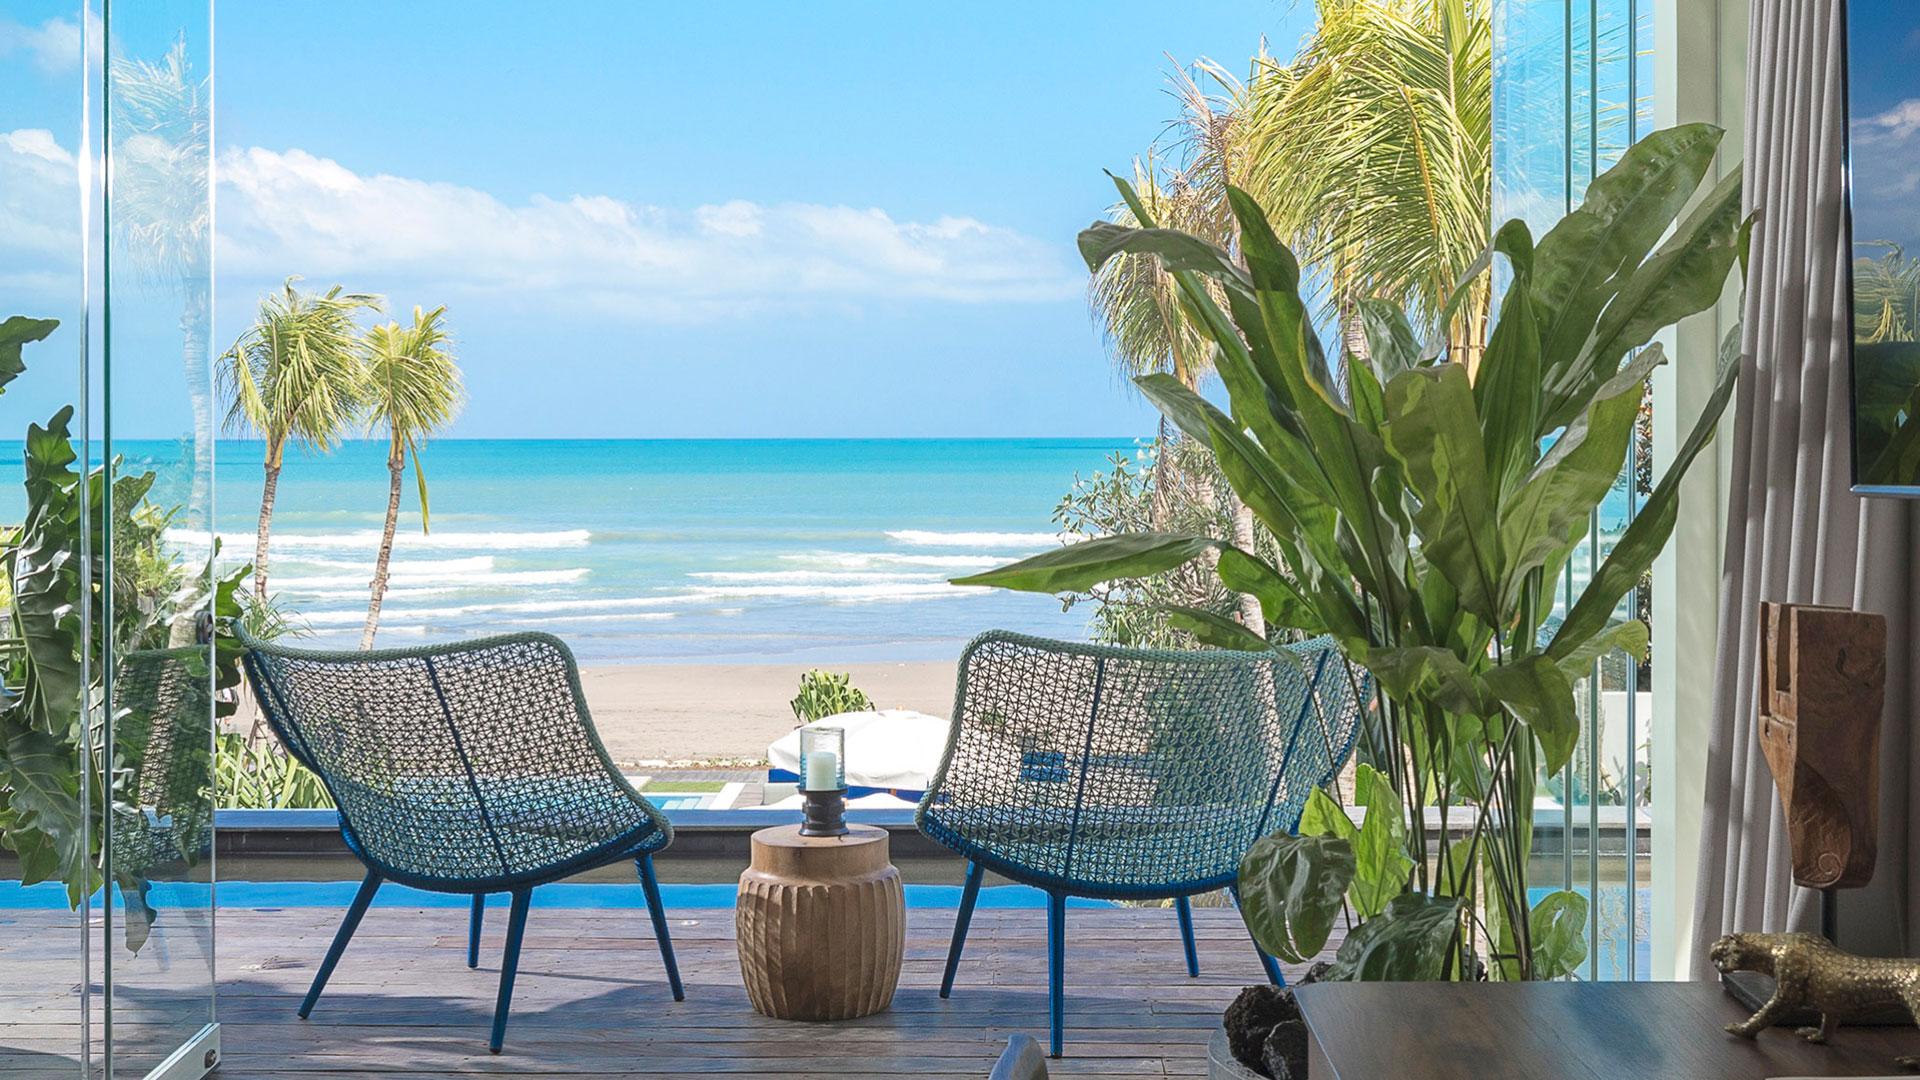 Top Luxury Bali Beachfront Villas Ultimate Bali